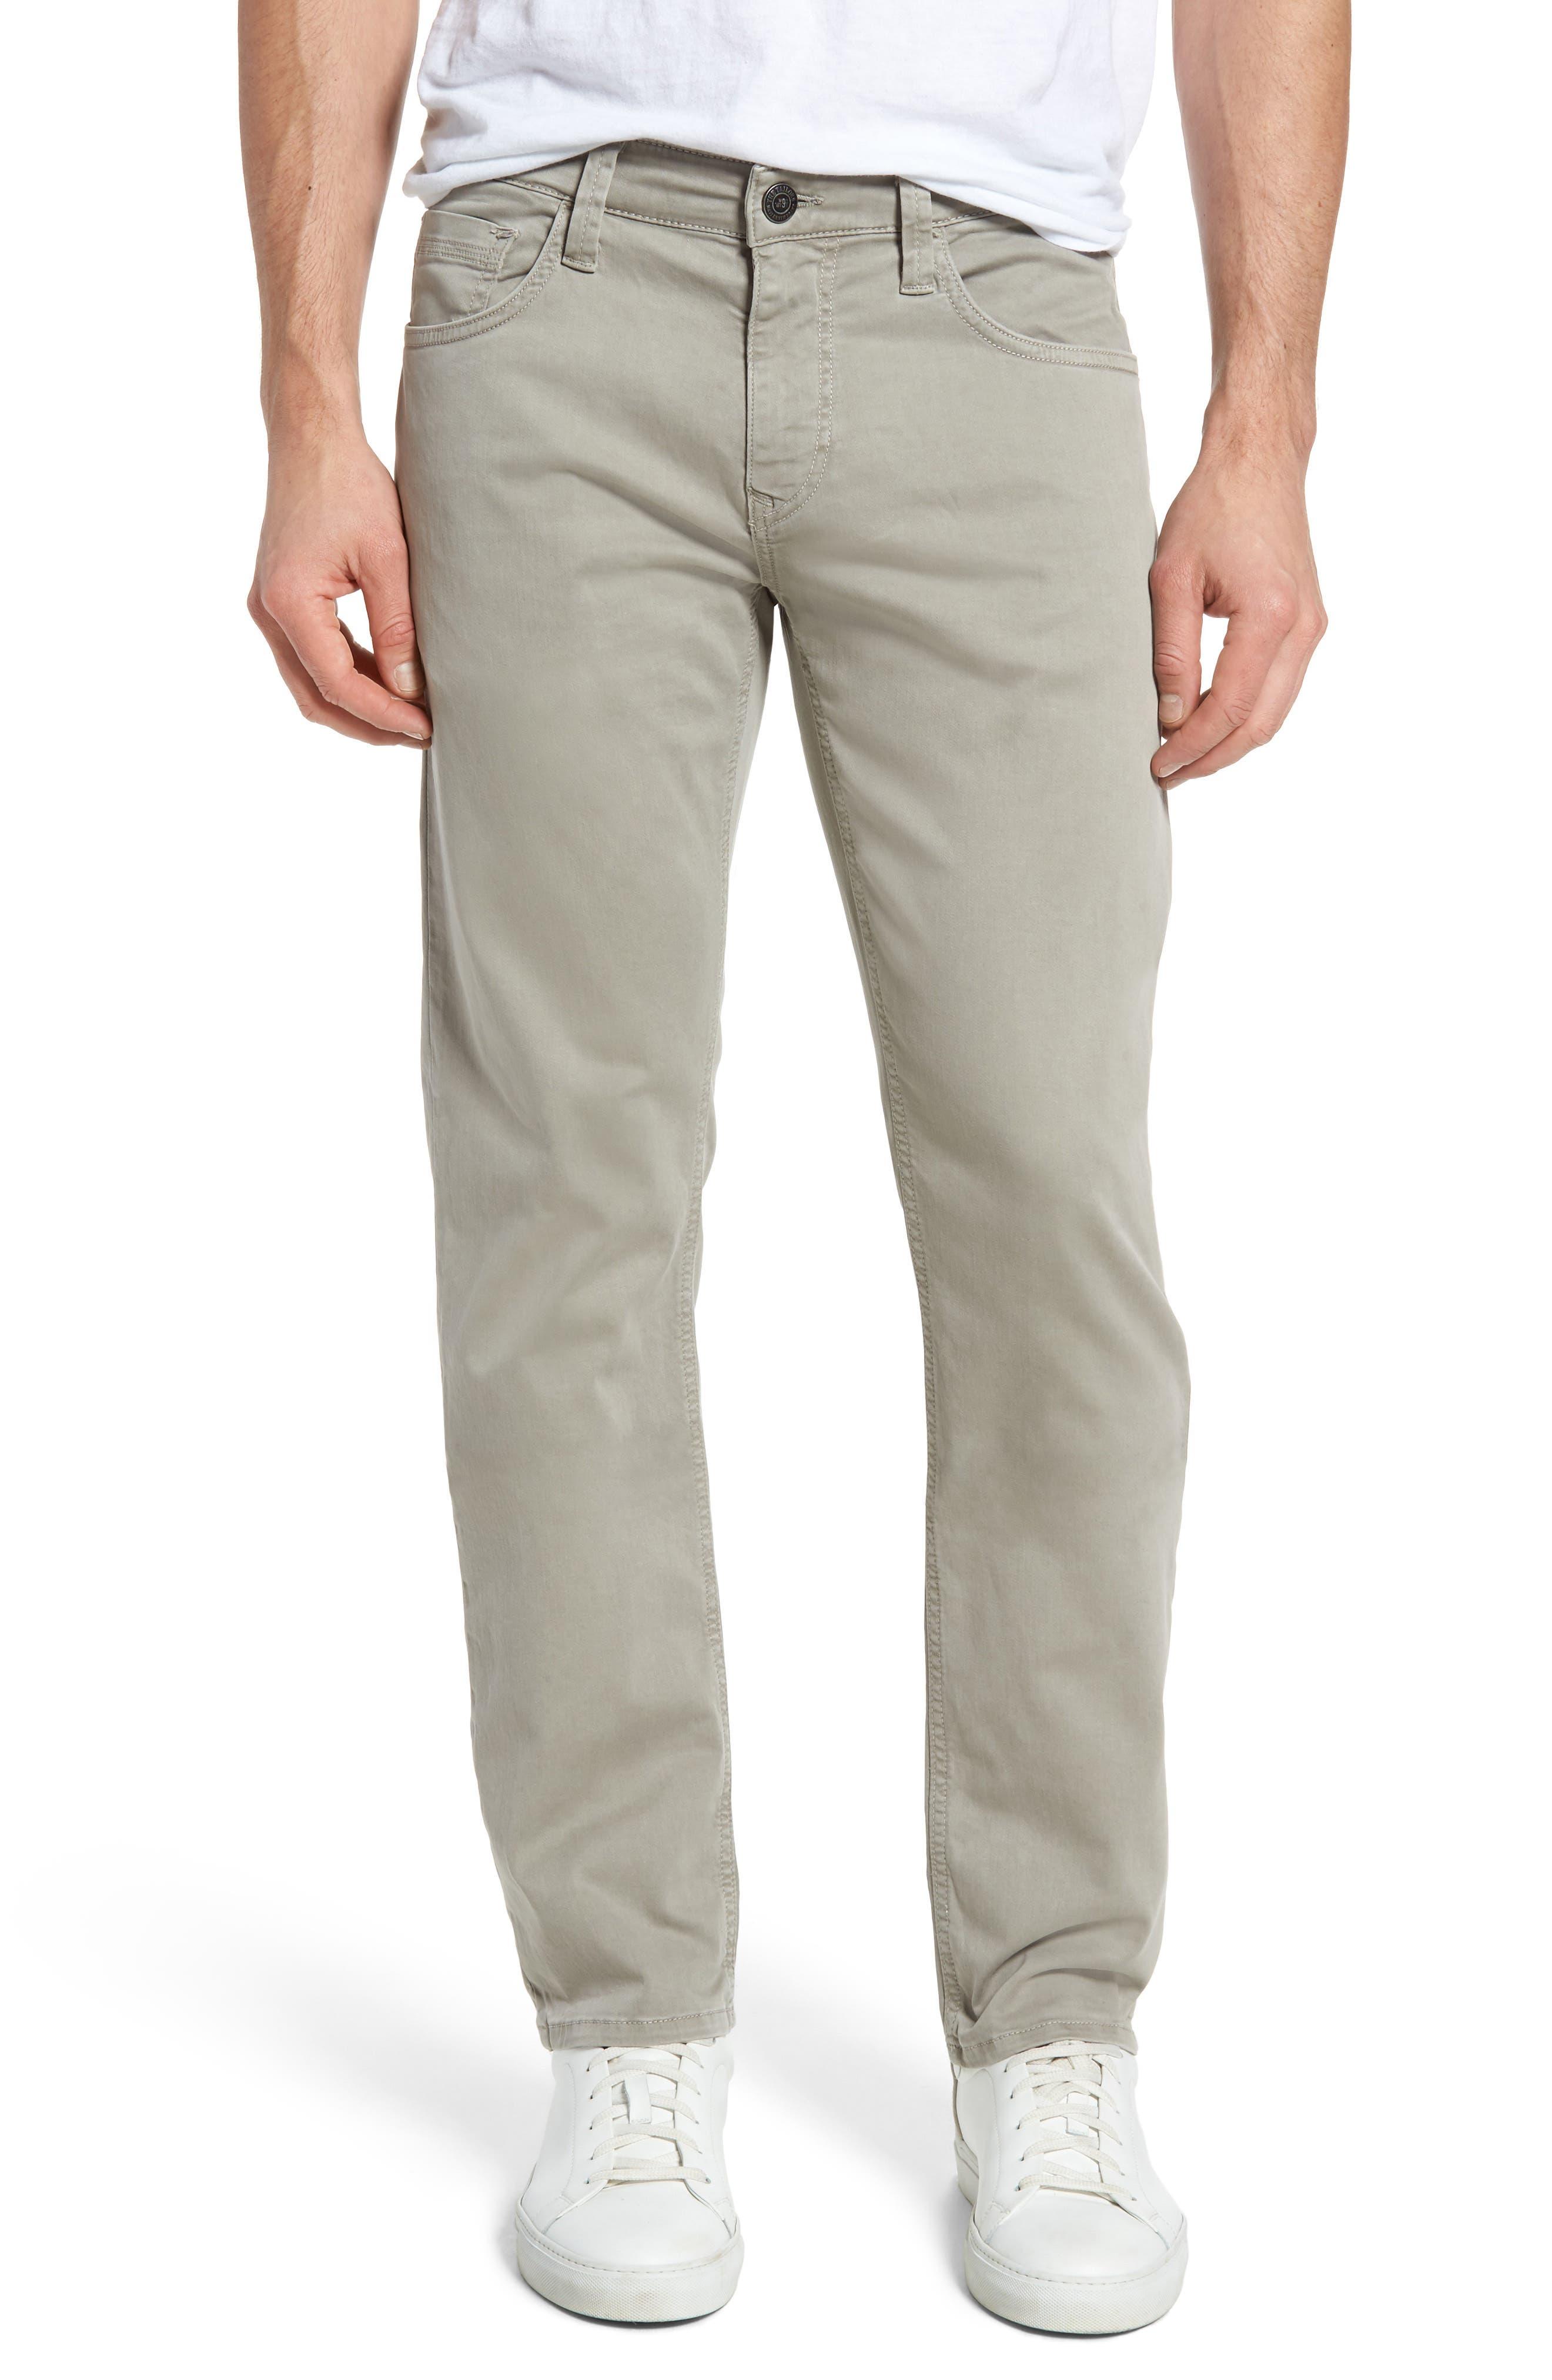 Zach Straight Leg Pants,                         Main,                         color, ZACH GREY TWILL